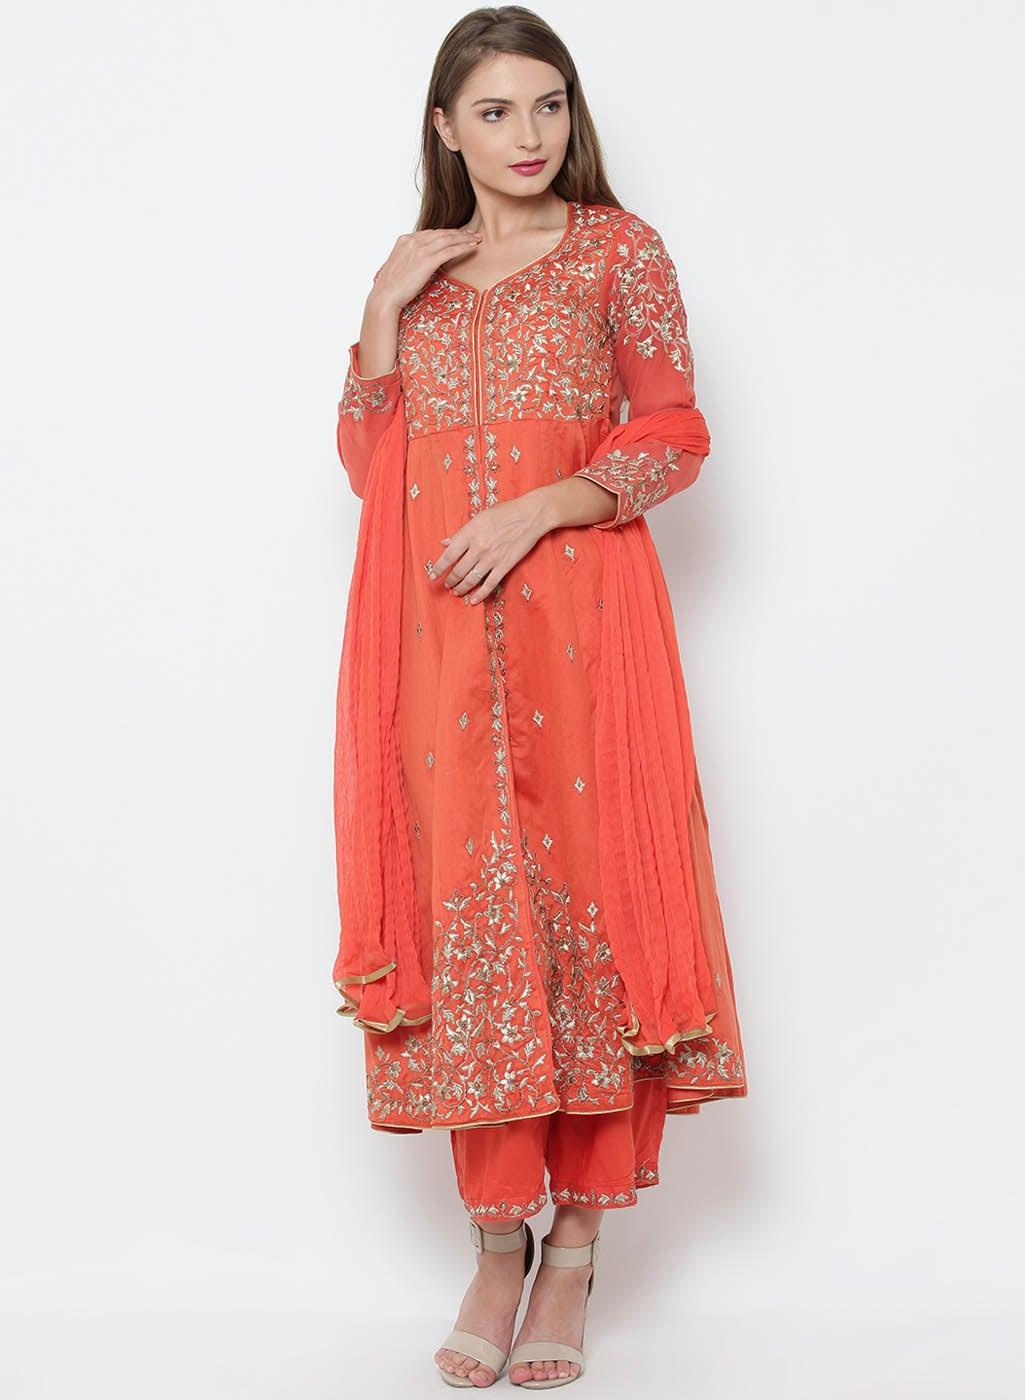 Ihram Kids For Sale Dubai: Orange Women Suit Sets Salwar Kameez Dupatta